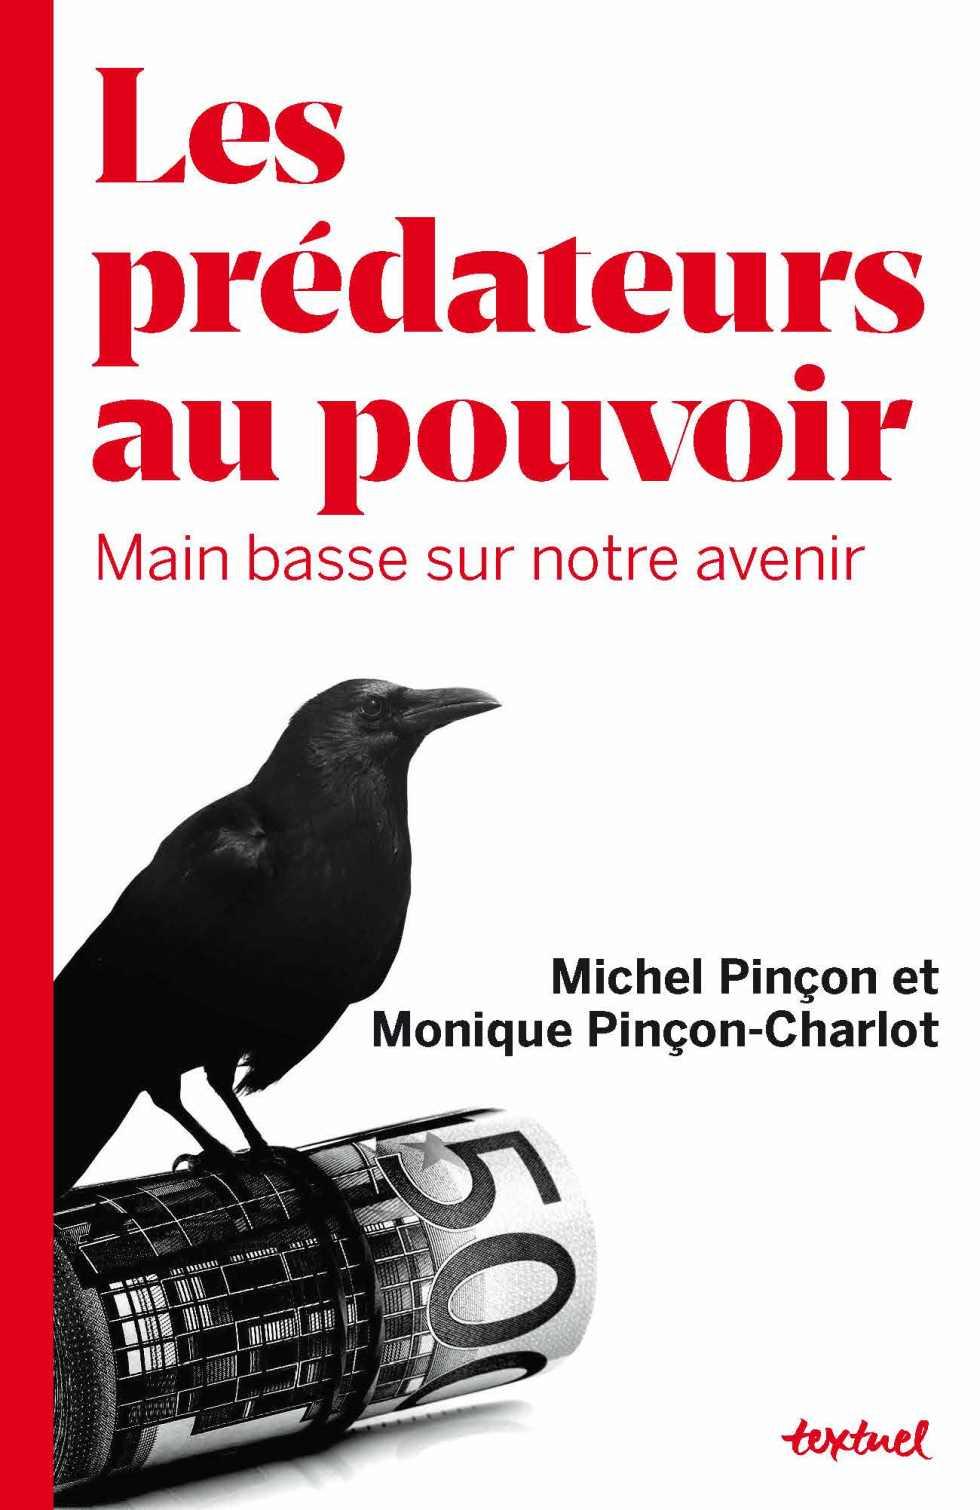 Pincon-charlot